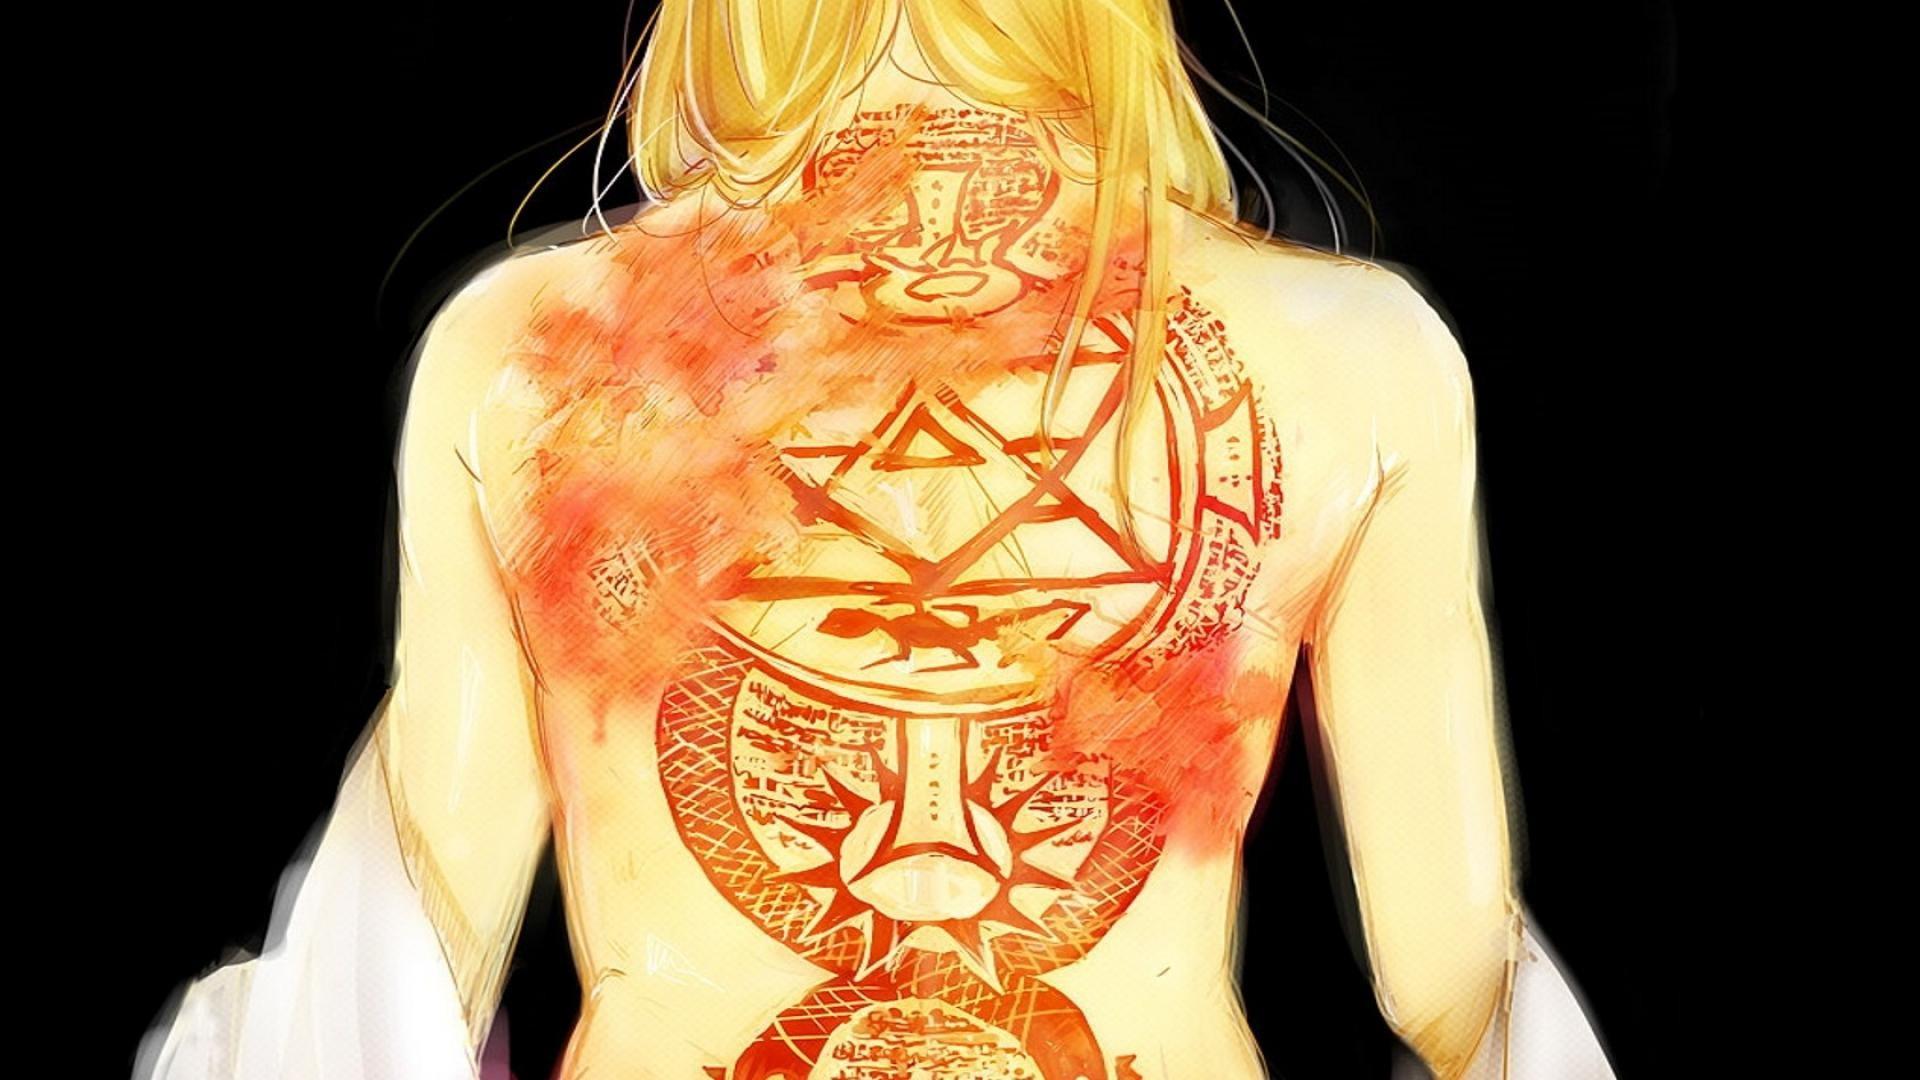 Anime – FullMetal Alchemist Fullmetal Alchemist: Brotherhood Riza Hawkeye  Wallpaper